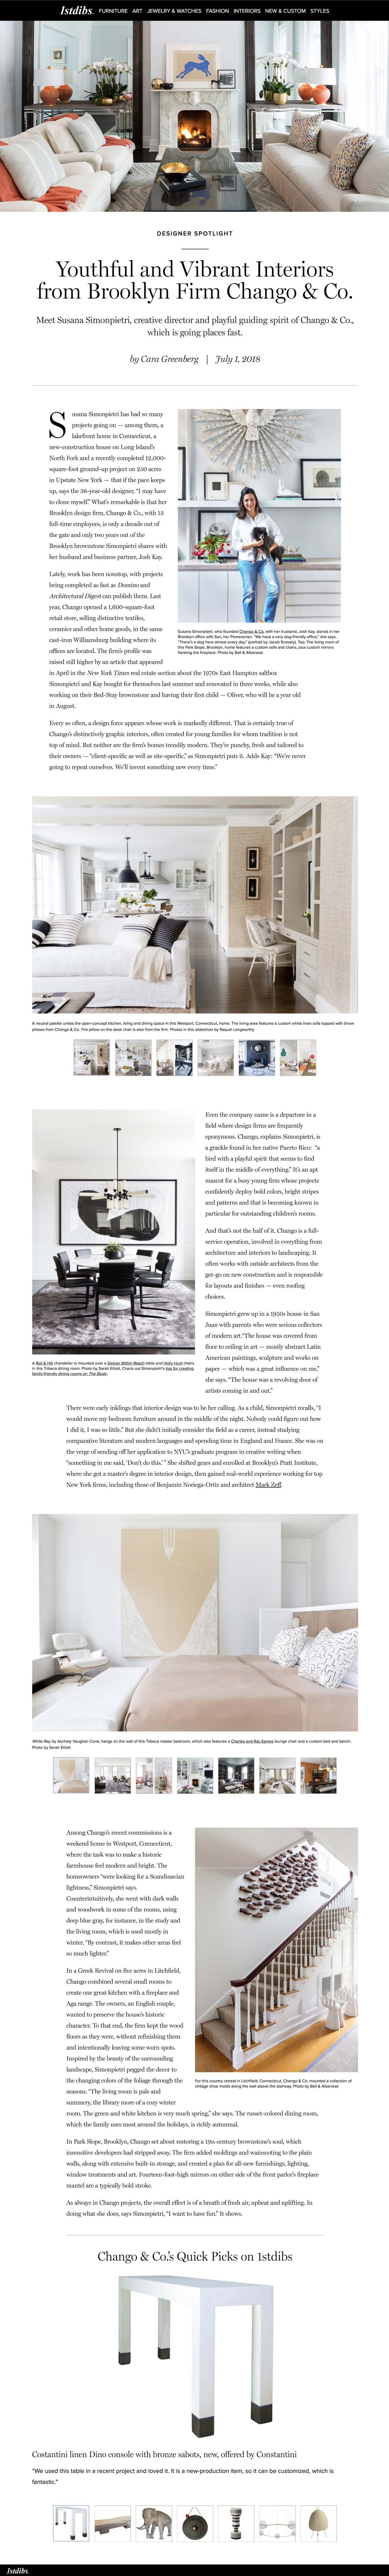 1stdibs-introspective-magazine-chango-and-co.jpg